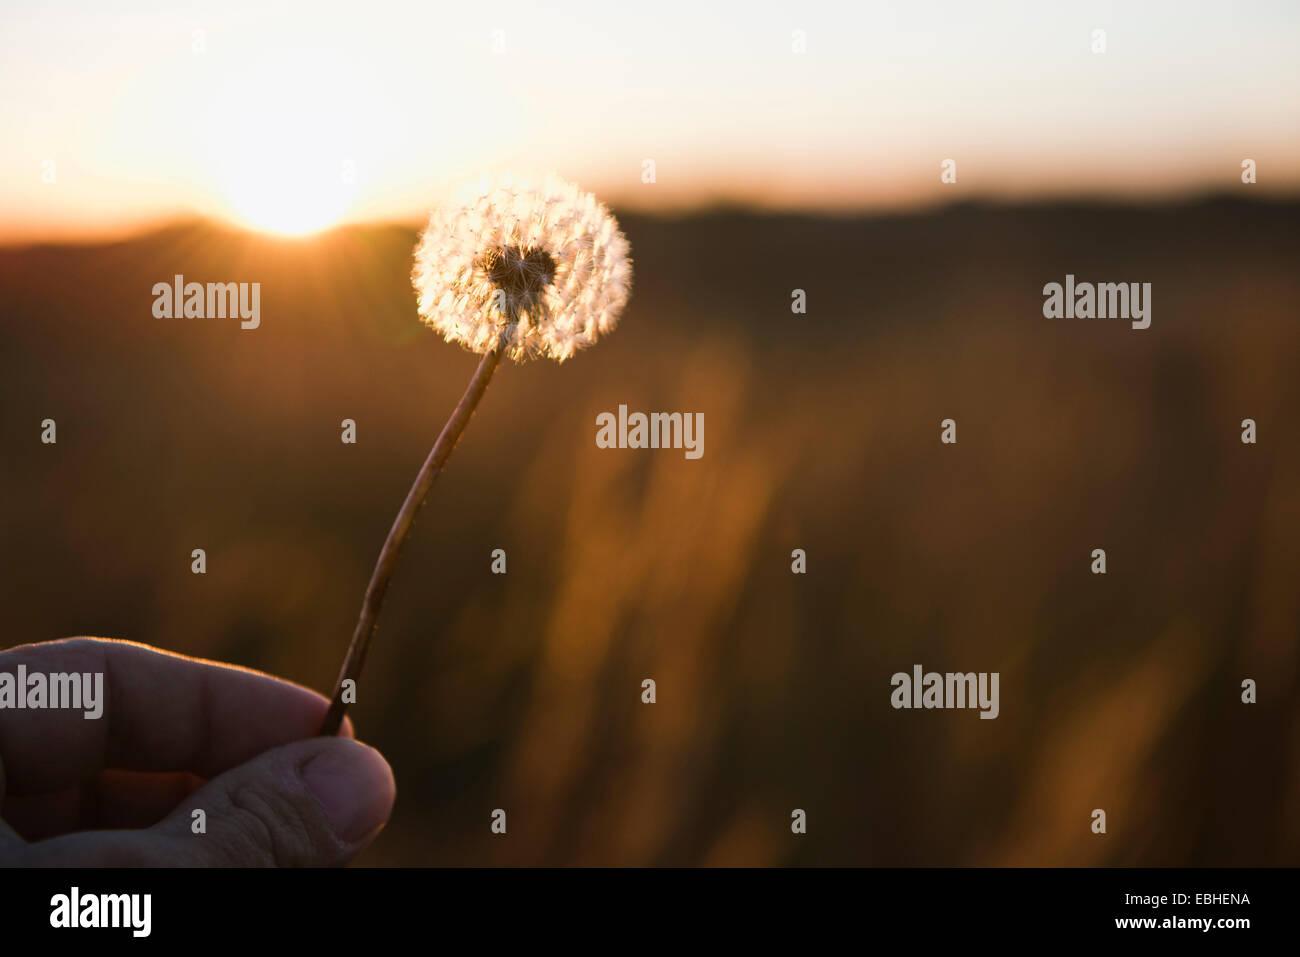 Farmers hand holding up dandelion clock at sunset, Missouri, USA Stock Photo